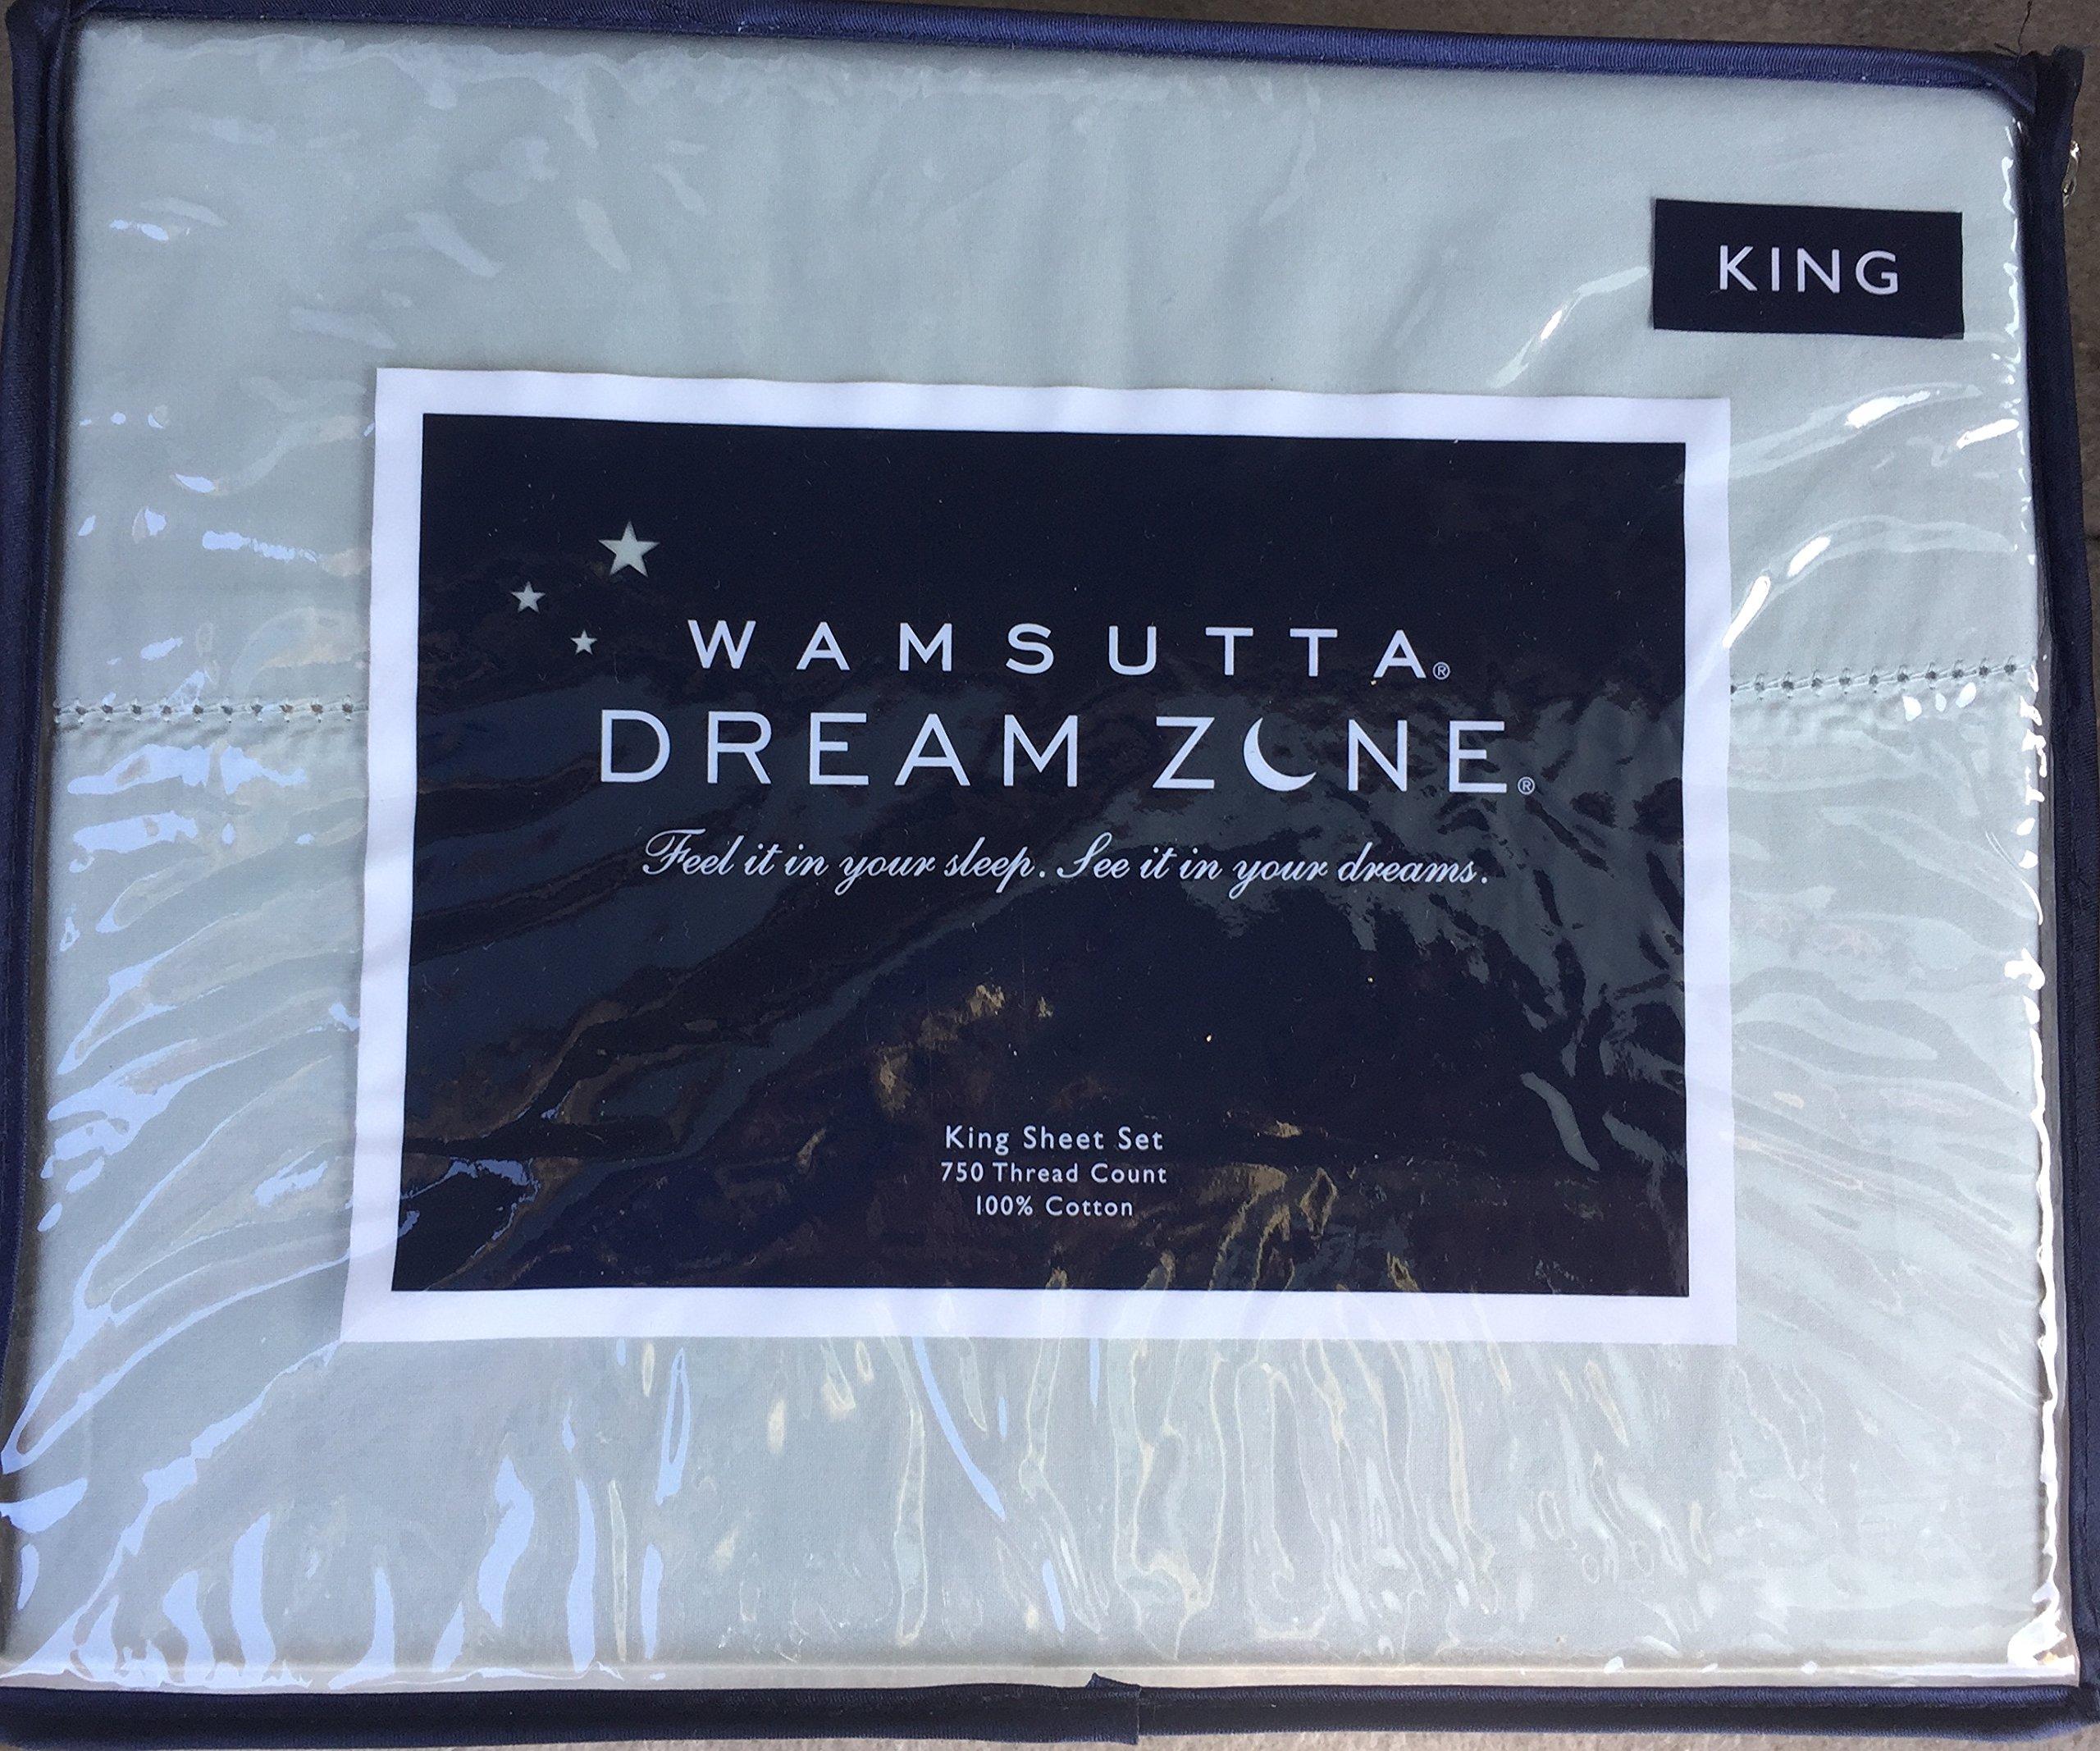 Wamsutta Dream Zone Aqua King Sheet Set, 750 Thread Count